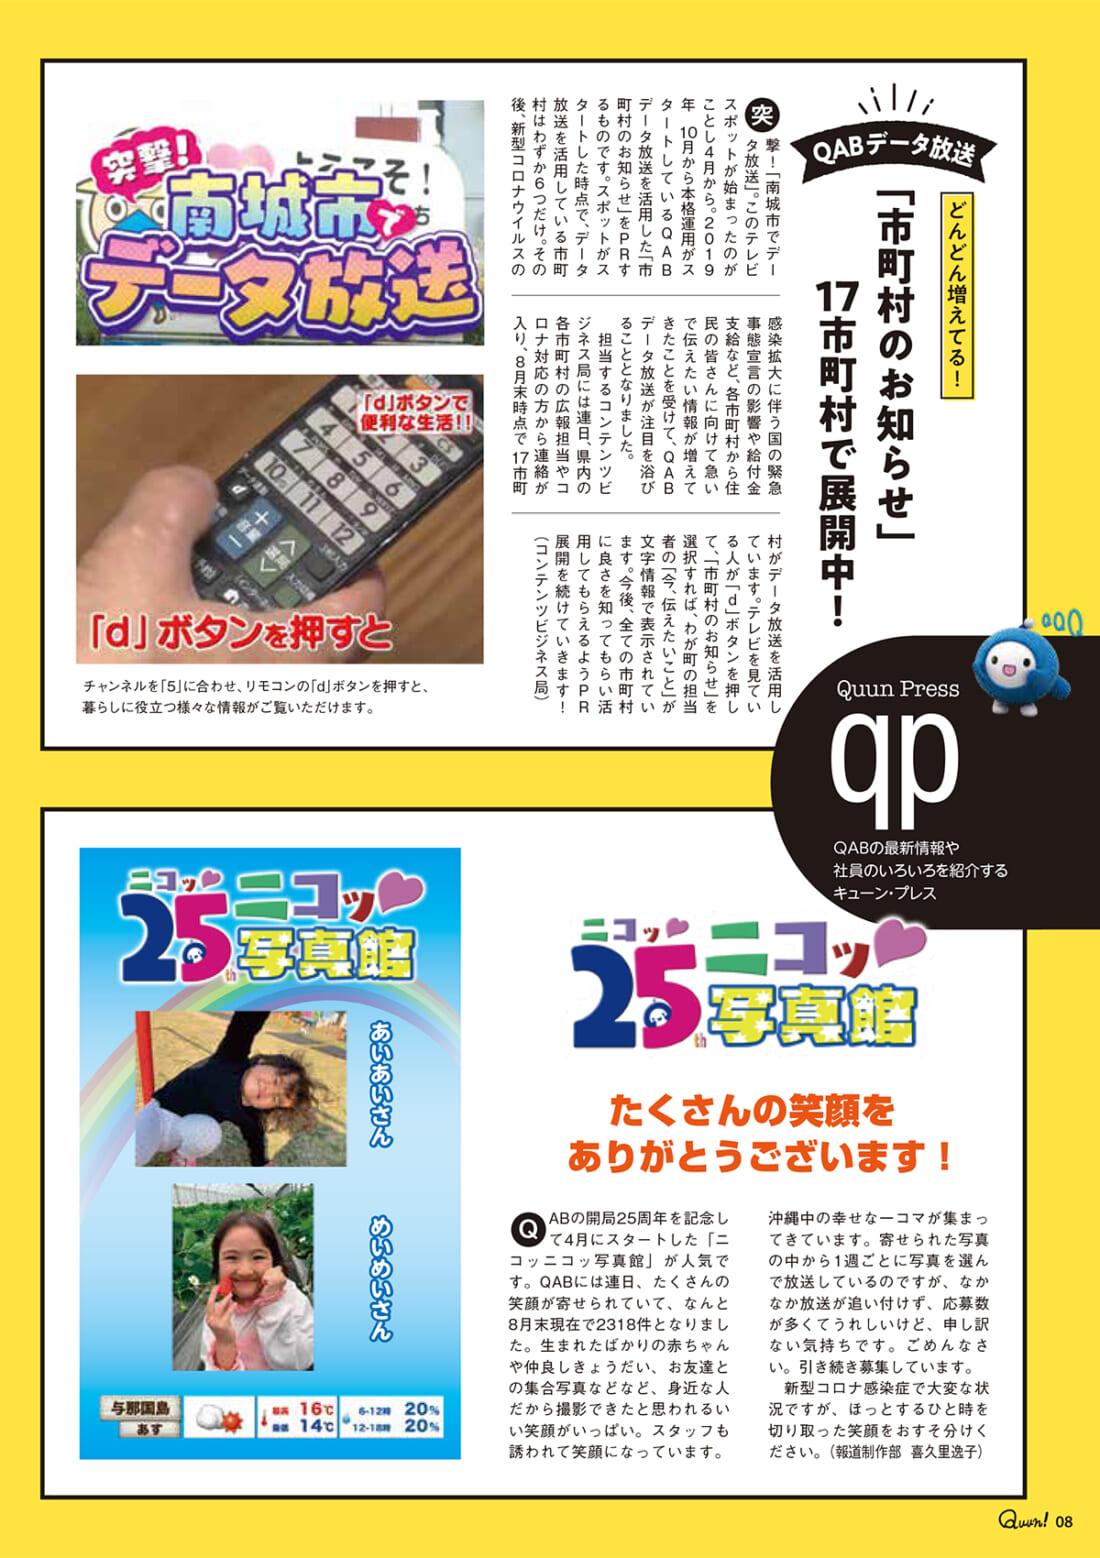 https://www.qab.co.jp/qgoro/wp-content/uploads/quun_1410-1100x1558.jpg